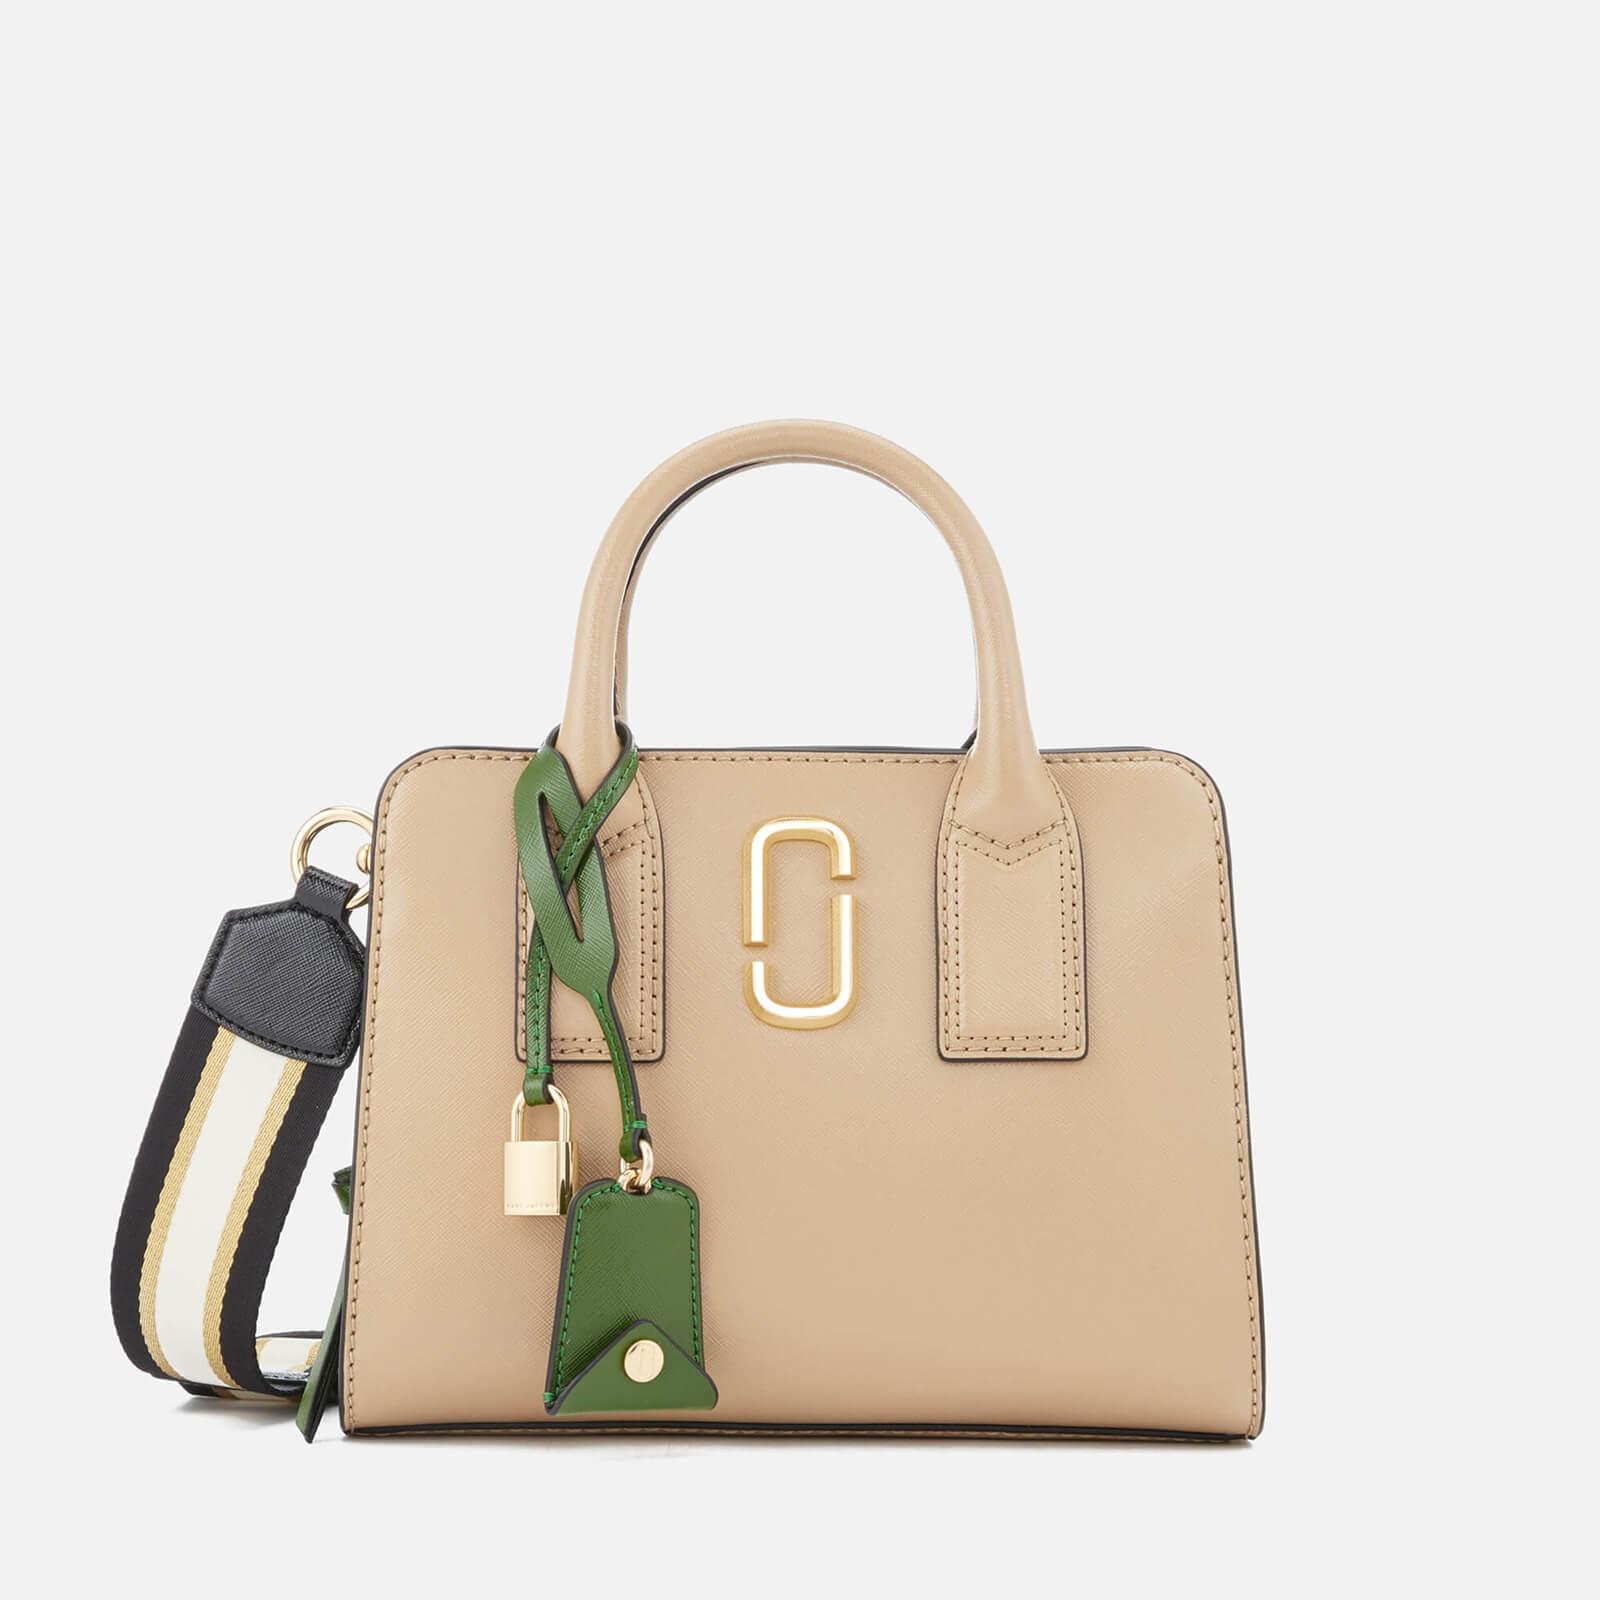 a92bcf7ada09 Marc Jacobs Women s Little Big Shot Tote Bag - Sandcastle Multi - Free UK  Delivery over £50